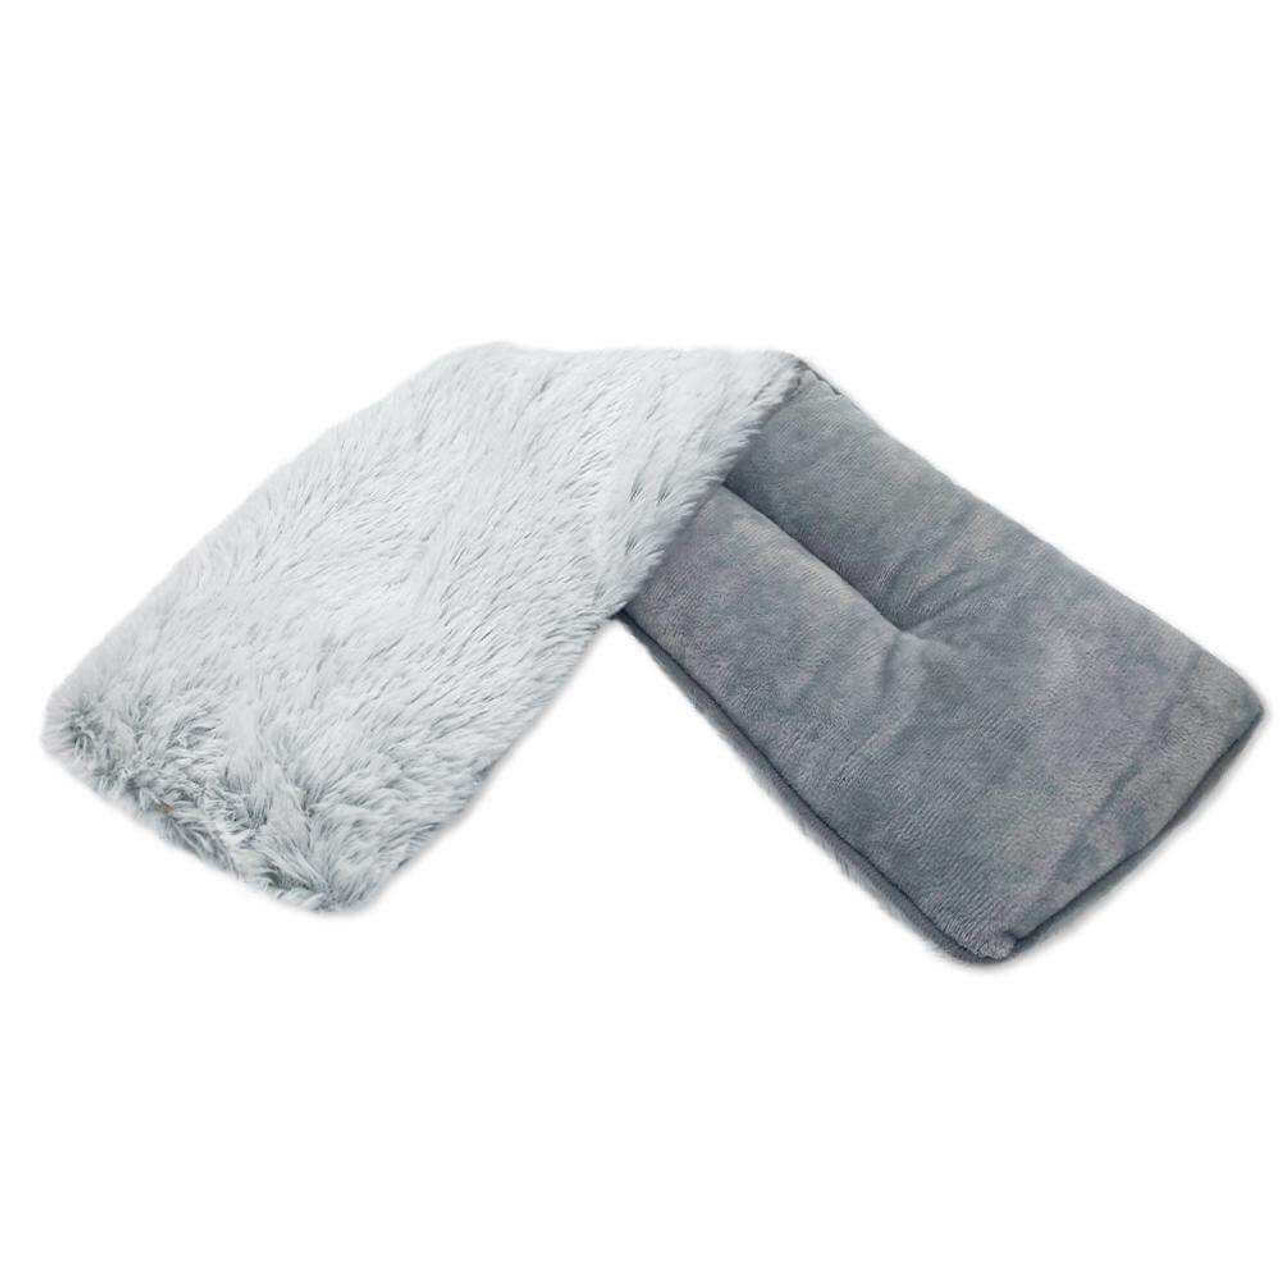 Warmie Neck Wrap in Marshmallow Gray